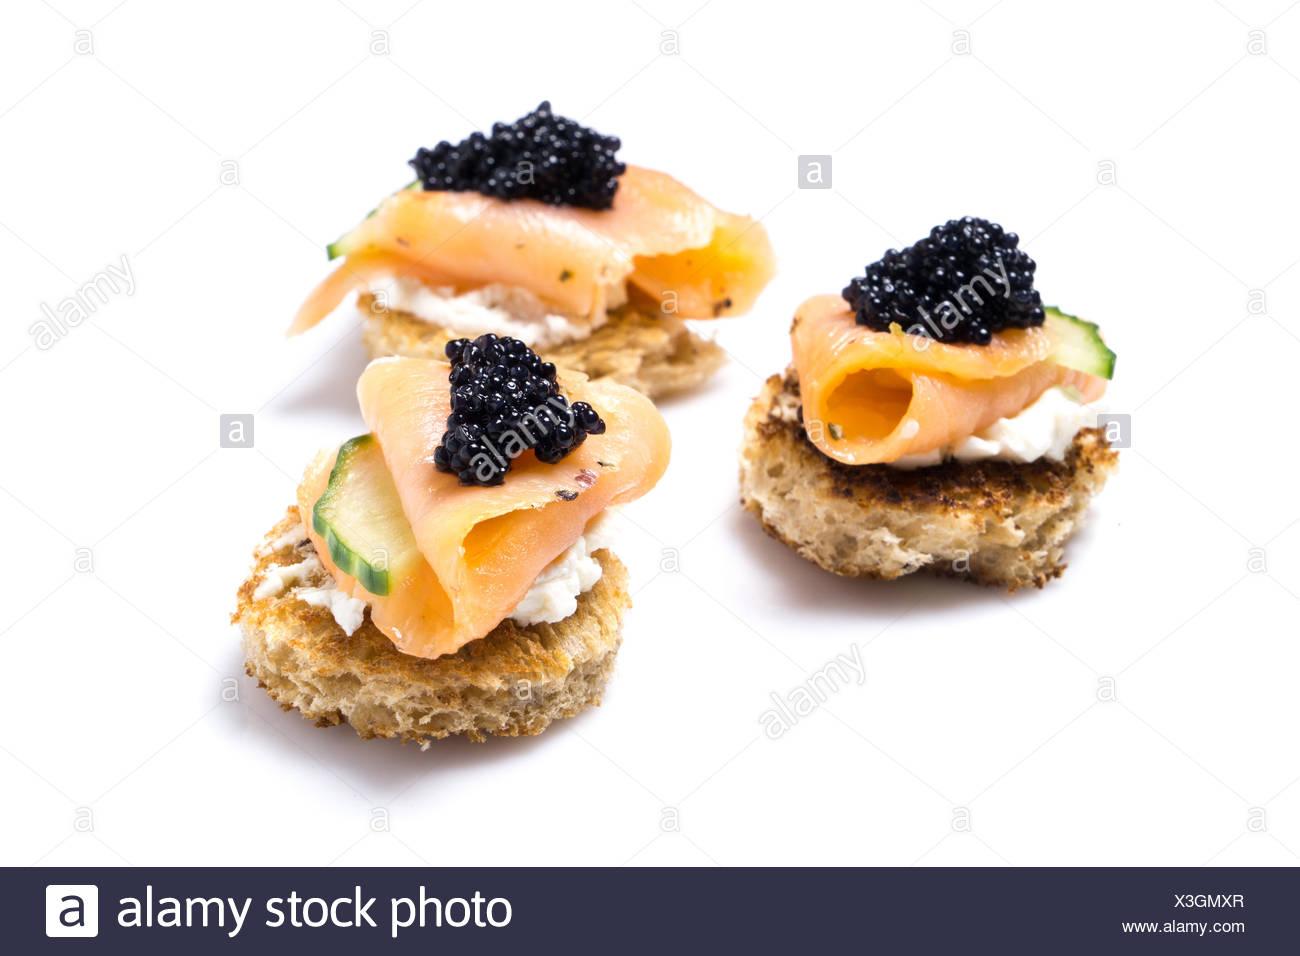 Smoked Salmon Canapes - Stock Image